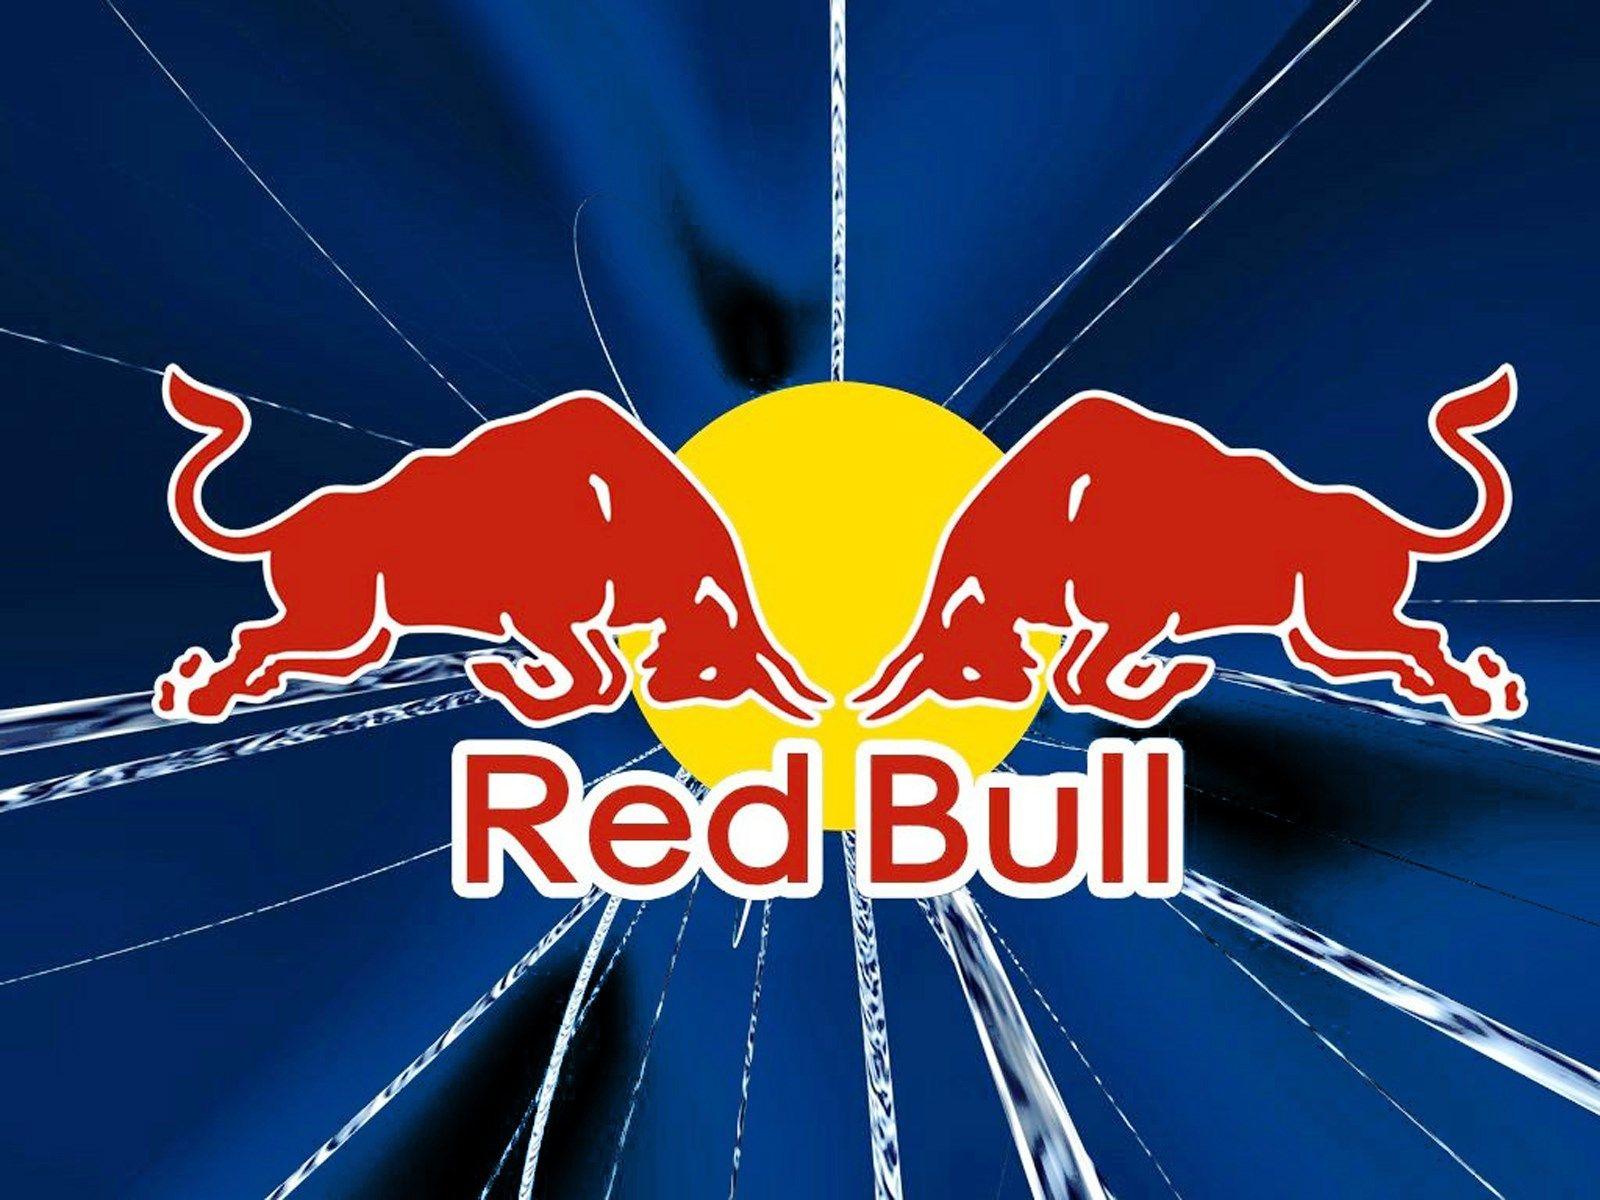 Hd Red Bull Logo Wallpaper Tato 3d